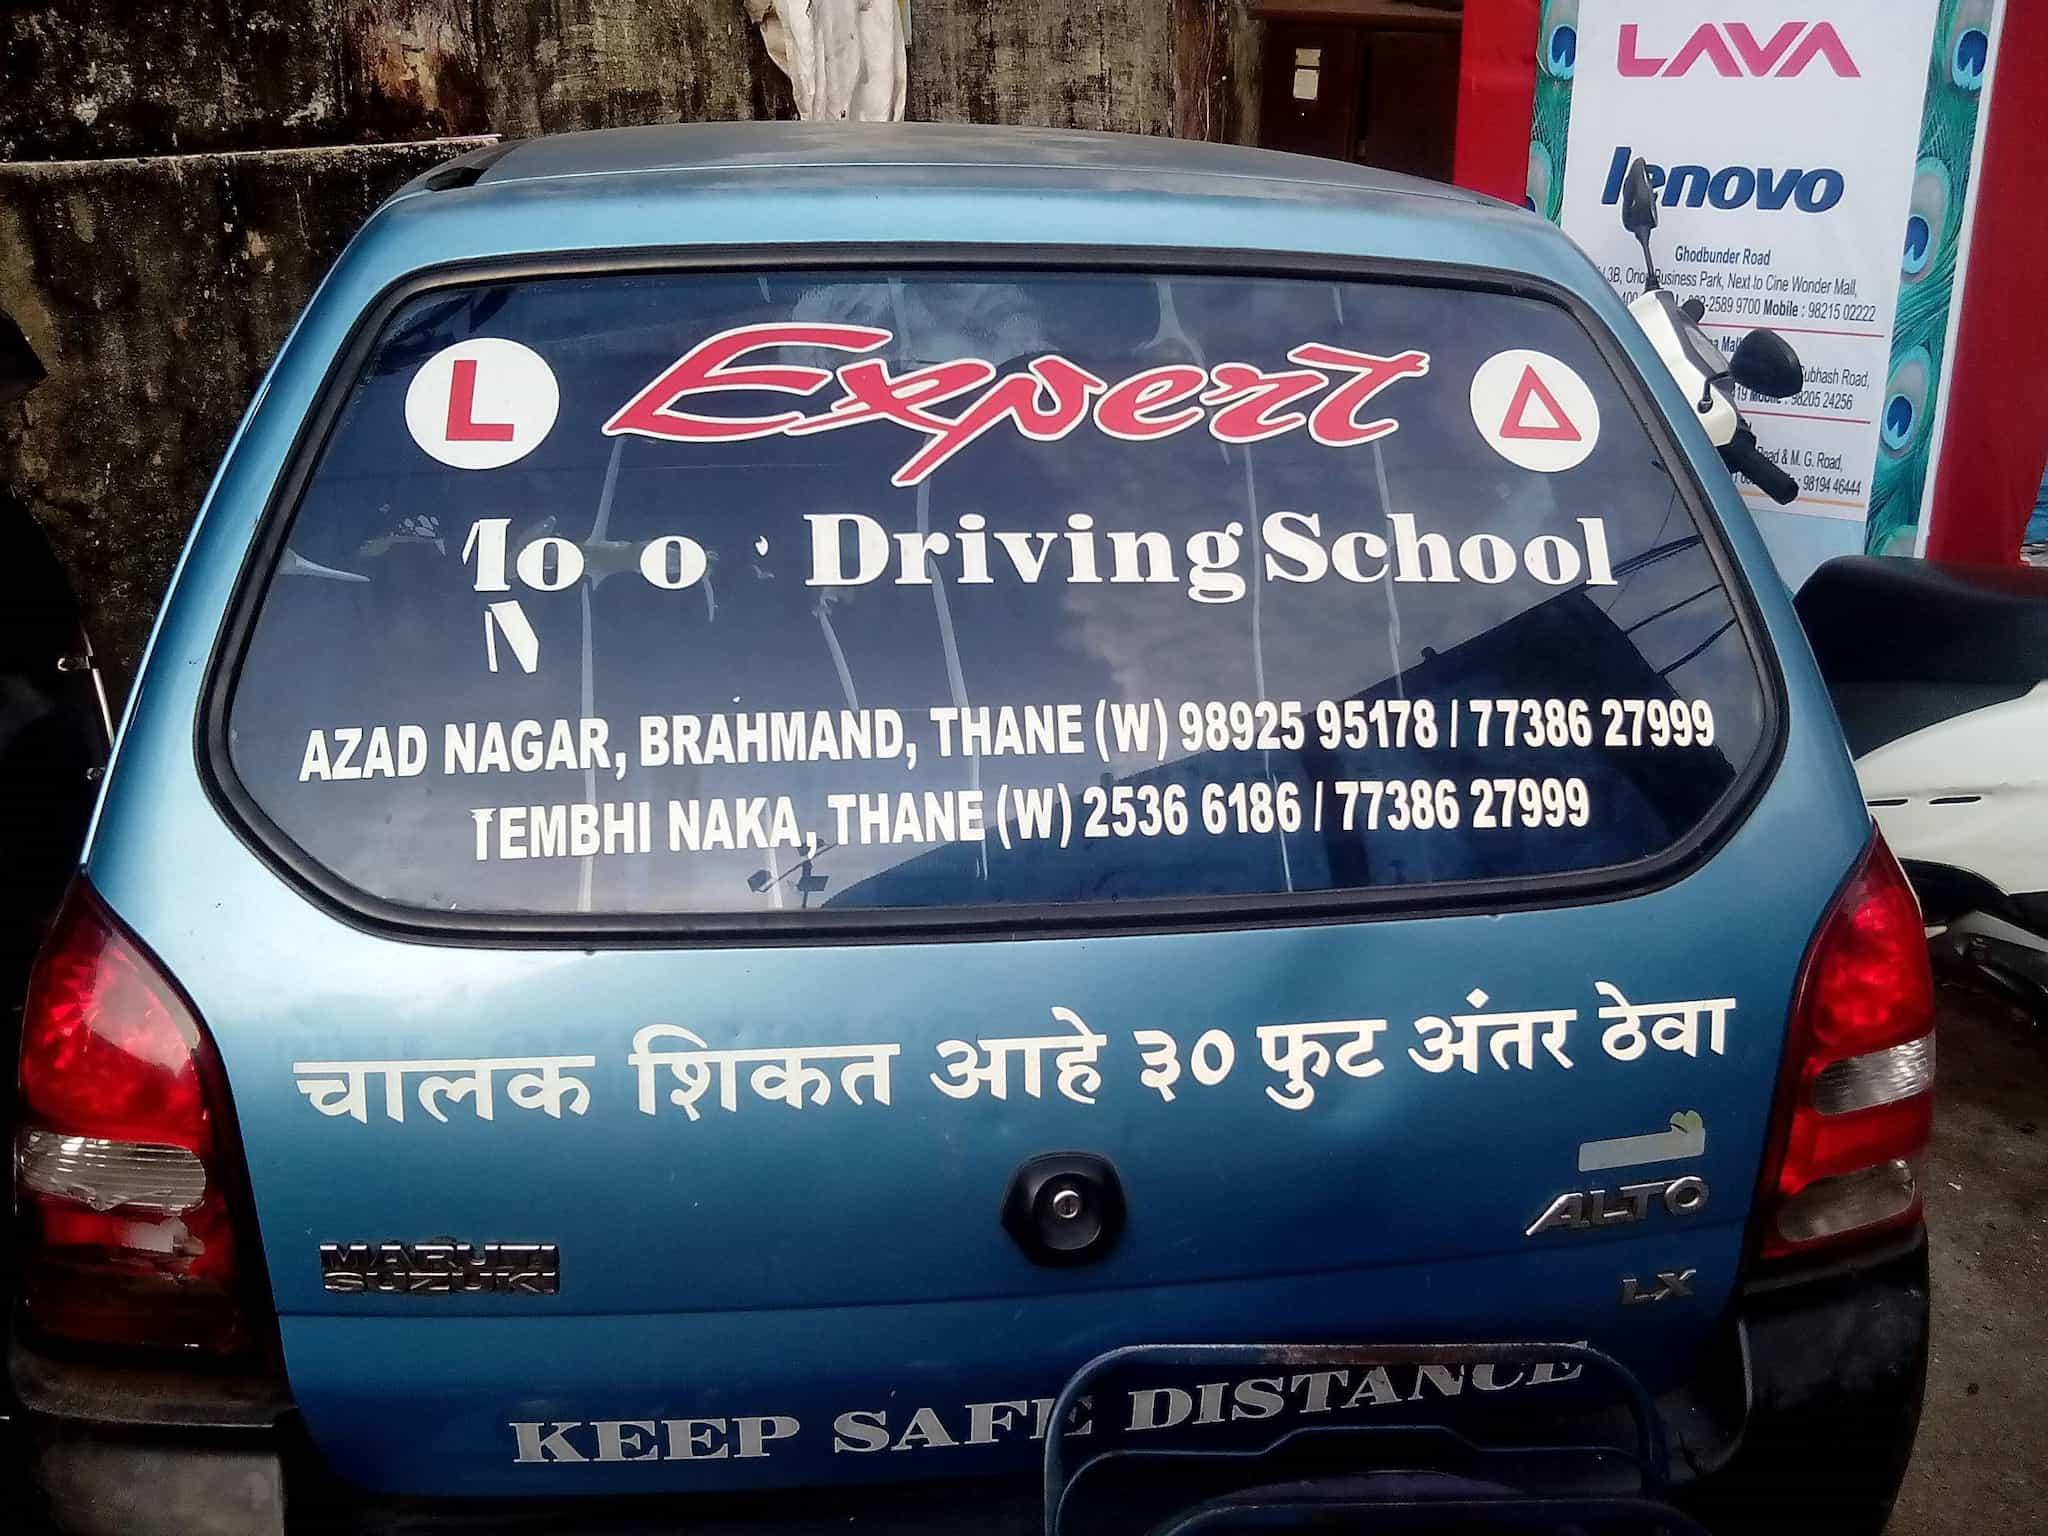 ... Car Back View - Expert Motor Driving School Photos, Thane West, Mumbai - Motor ...